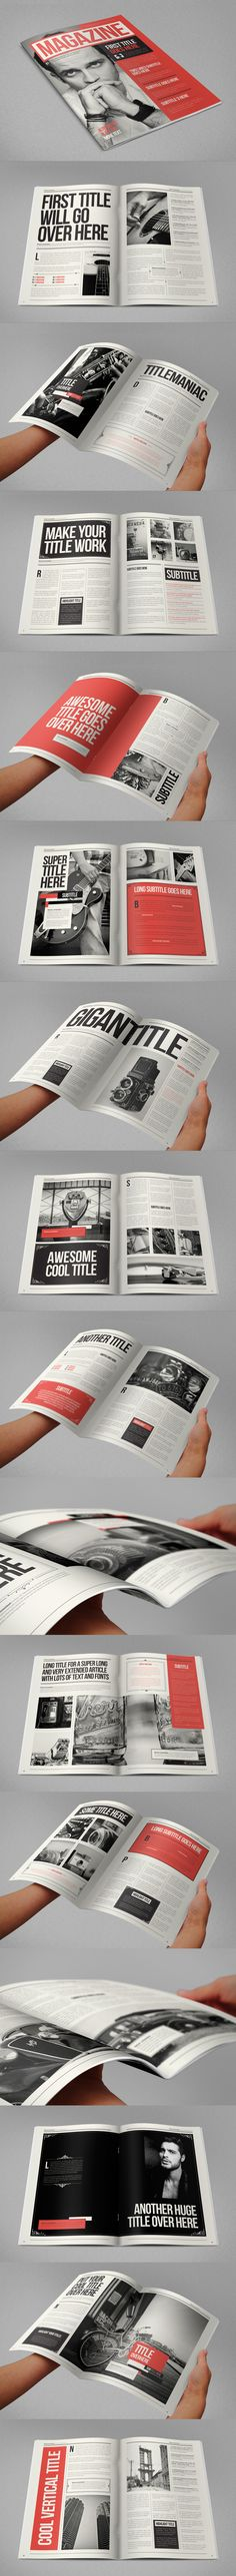 Retro Vintage Magazine. Download here: http://graphicriver.net/item/retro-vintage-magazine/8682759?ref=abradesign #magazine #design